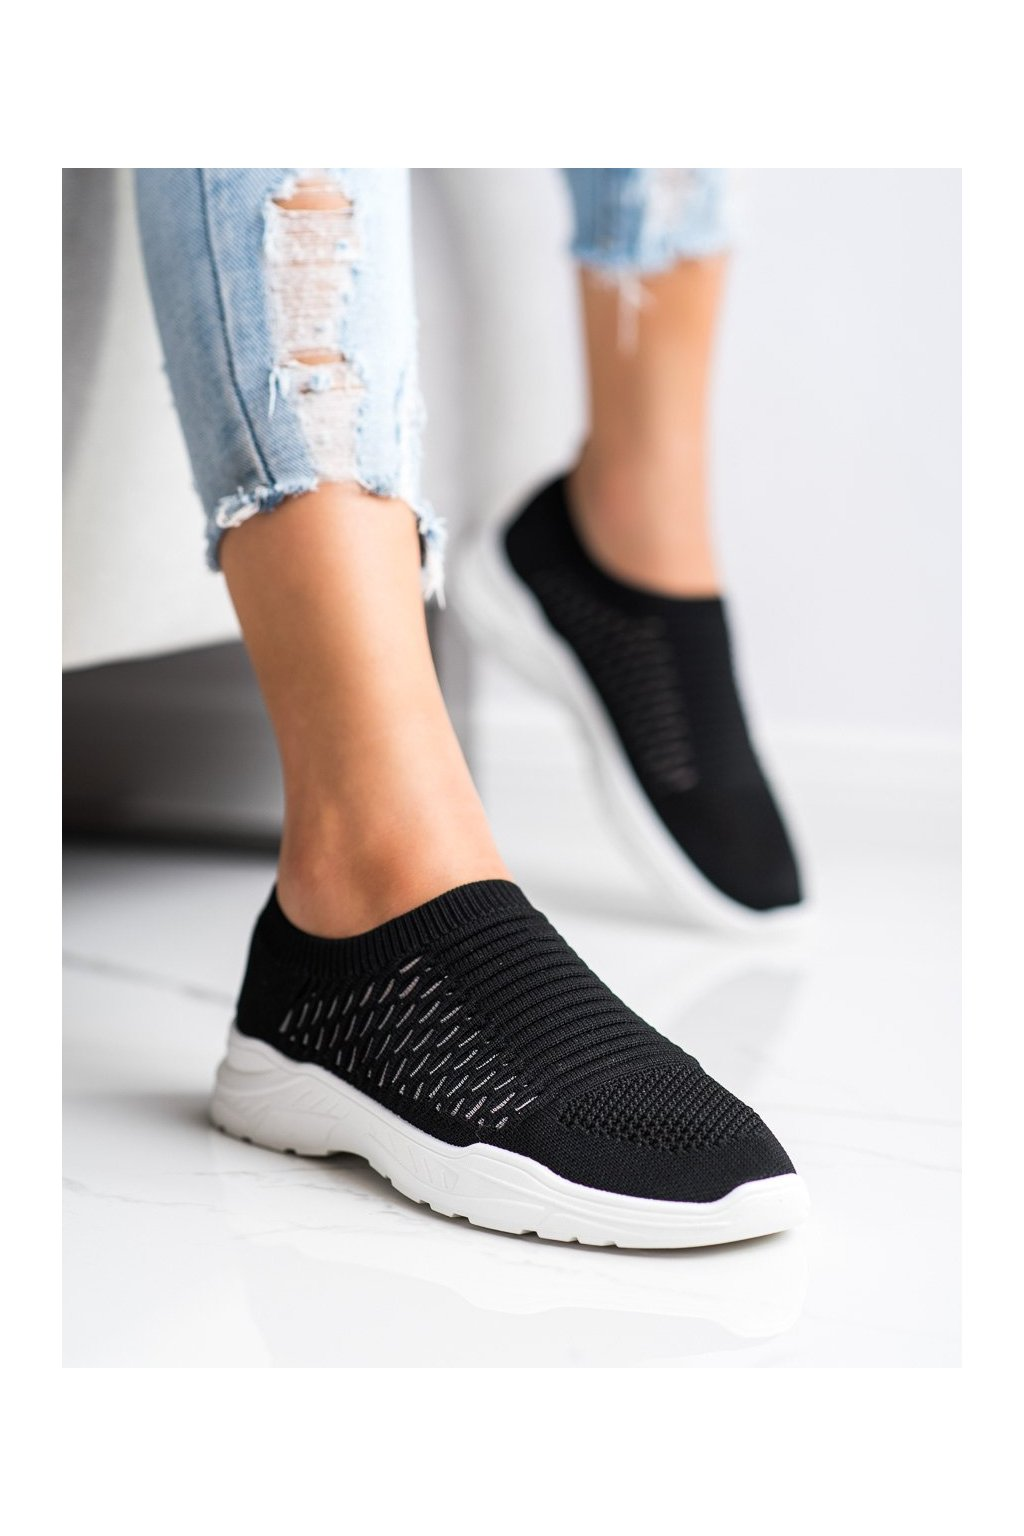 Čierne tenisky Ideal shoes kod 9862B/W